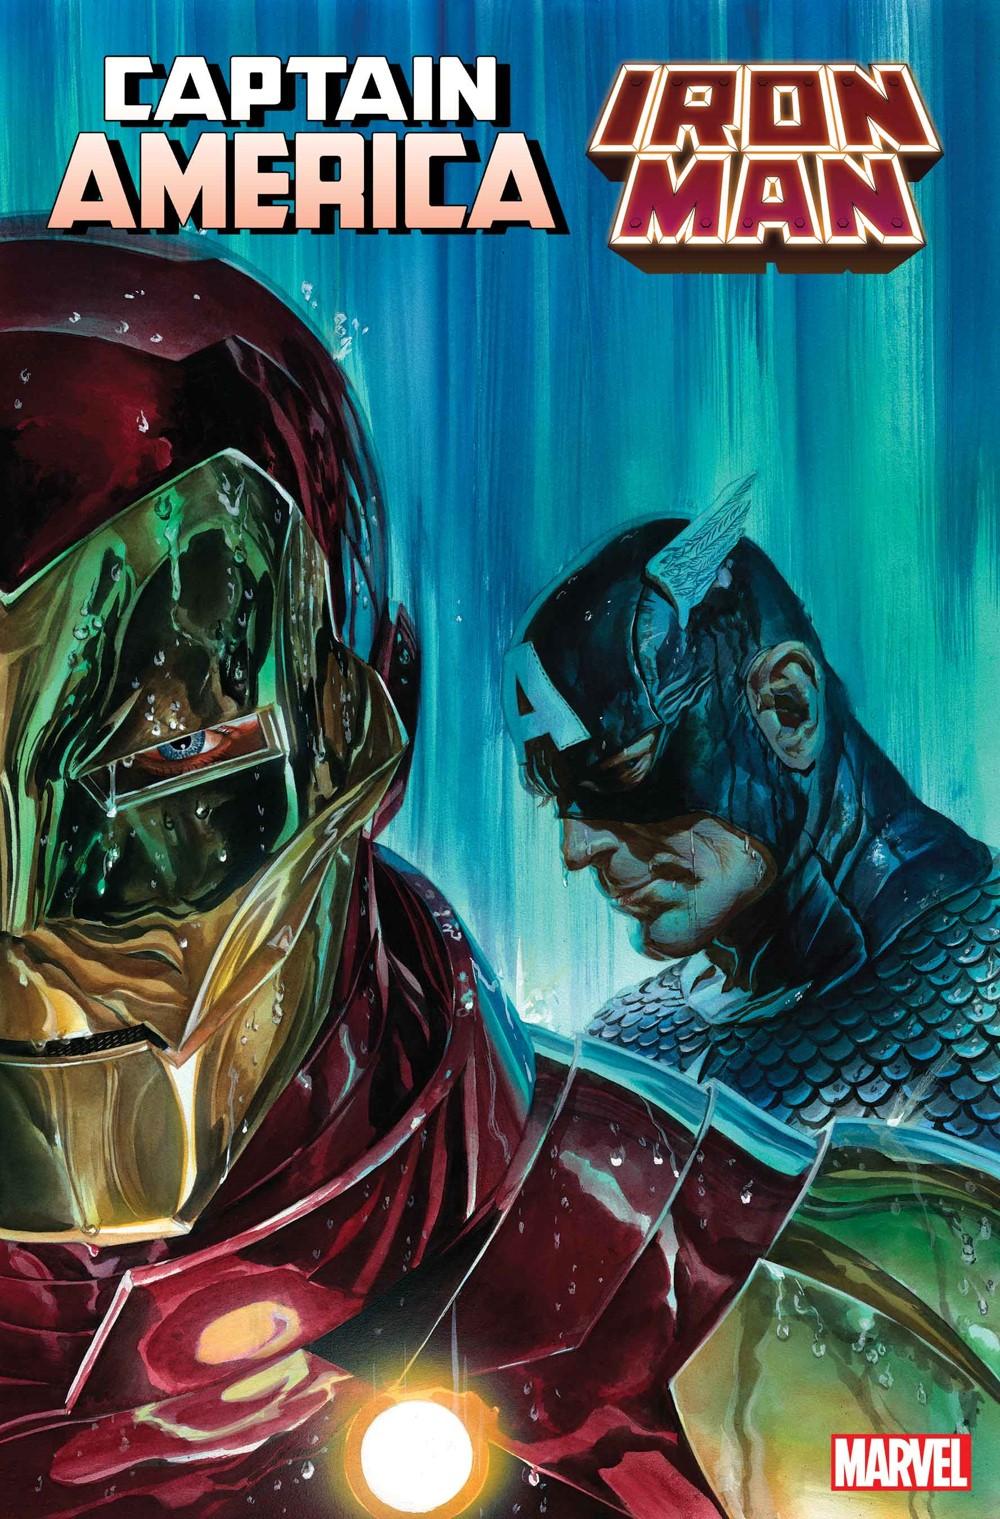 CAPAIM2021002_Cov Marvel Comics December 2021 Solicitations